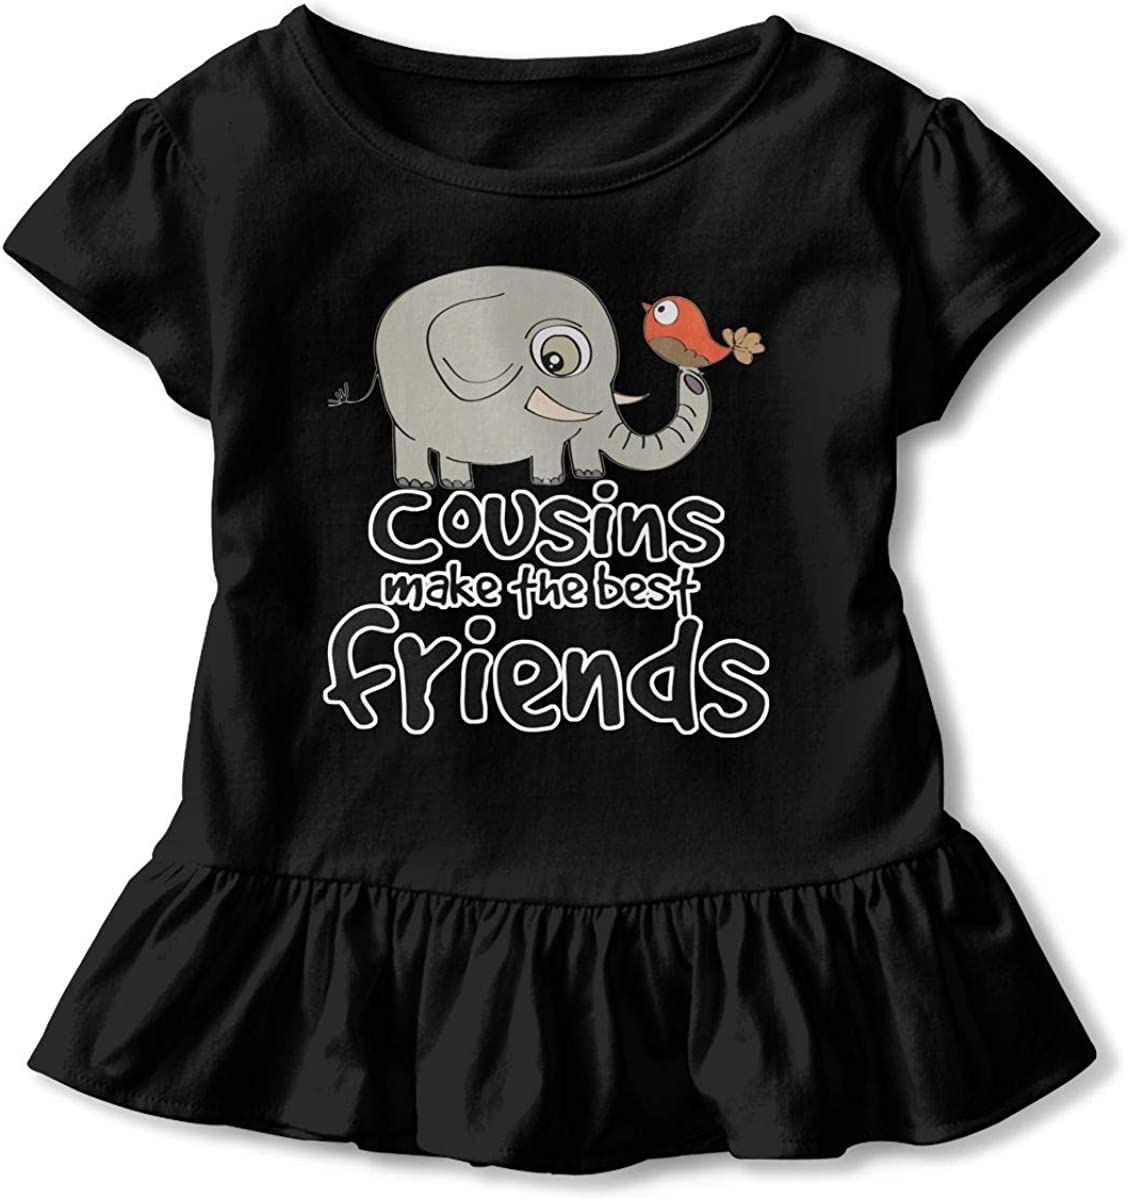 Cousins Make The Best Friends Baby Skirts Adorable Kids T Shirt